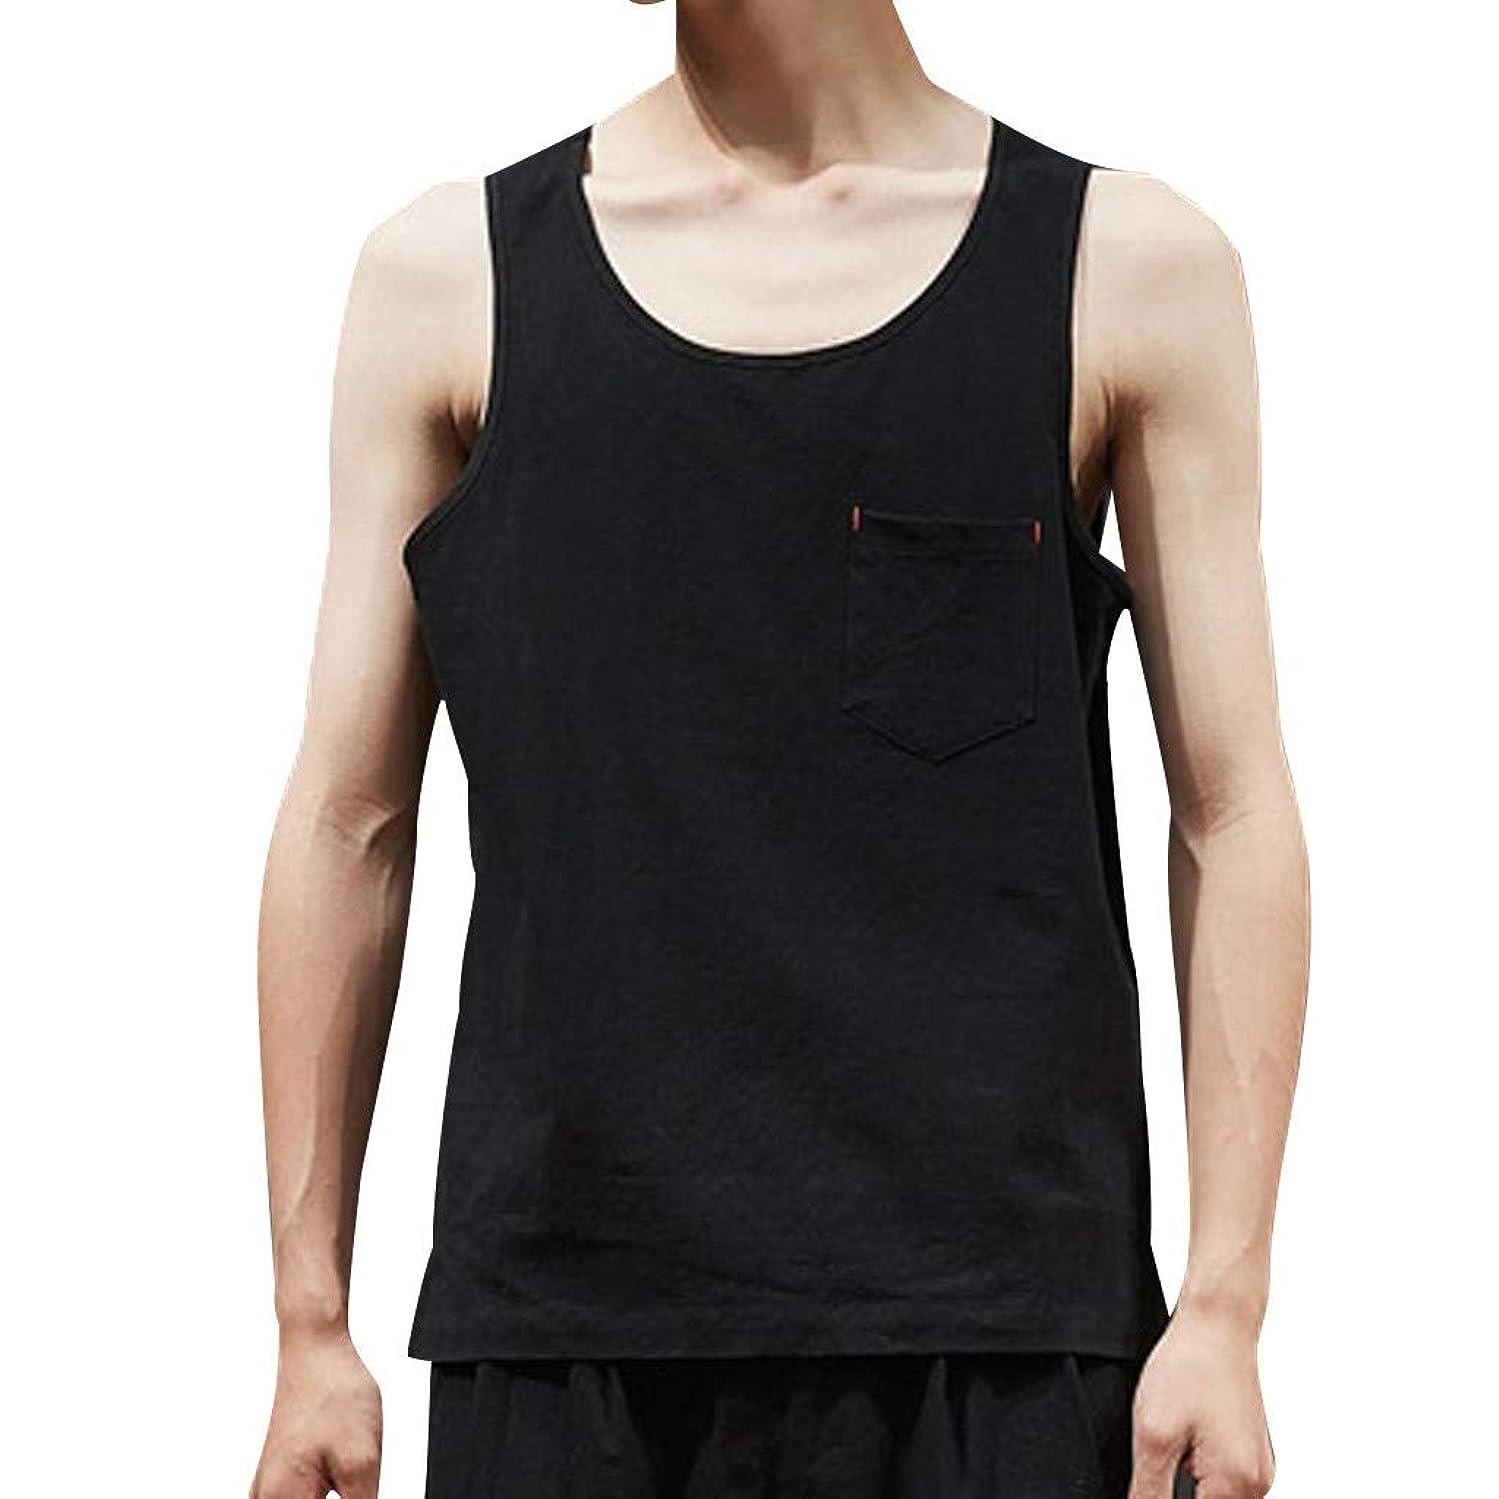 refulgence Tank Top Shirt for Training Mens Summer Compression Shirt Loose Underwear Vest